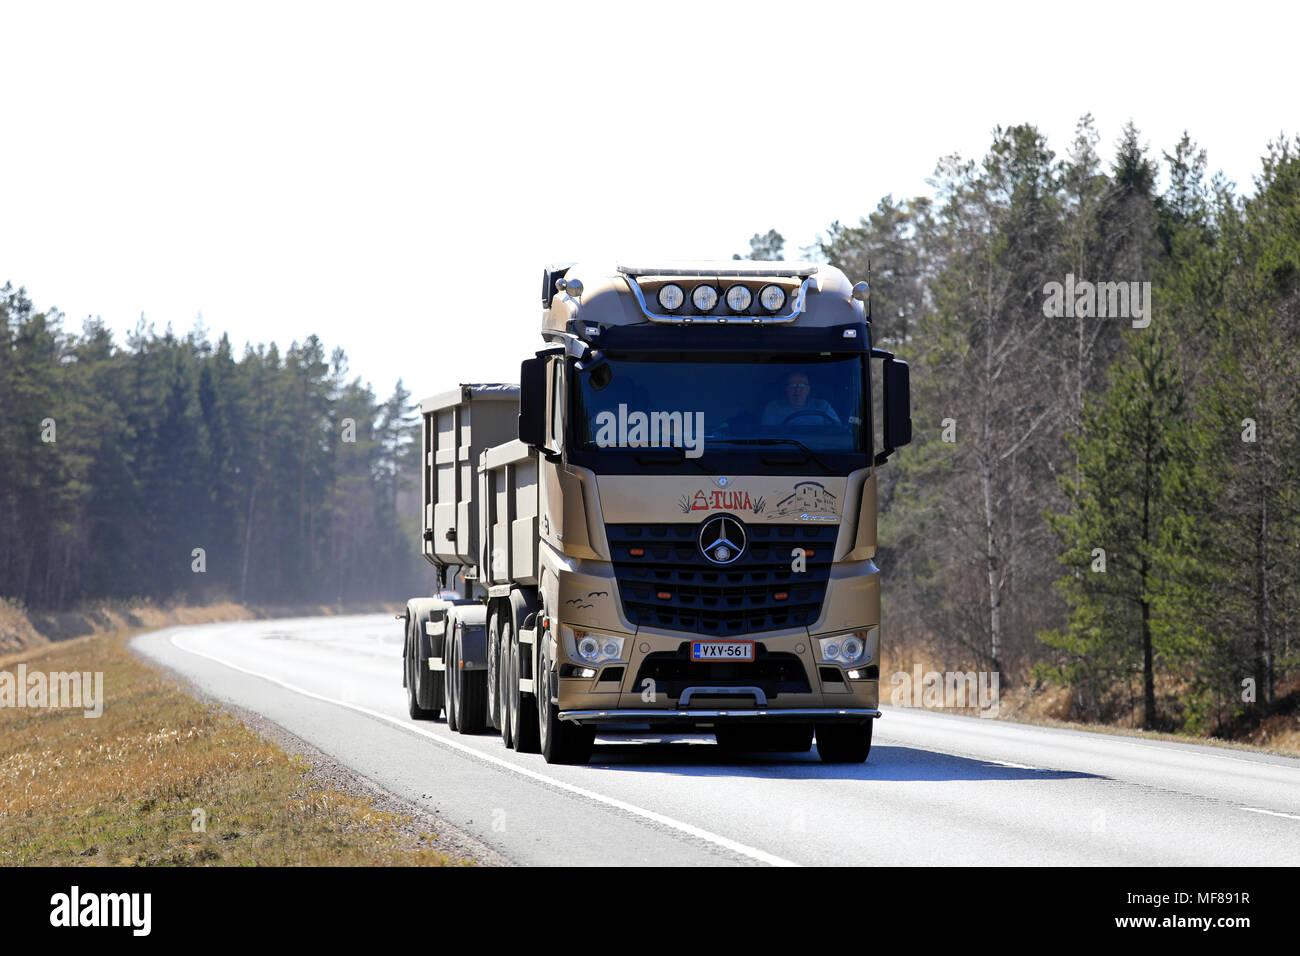 Mercedes-Benz oro Arocs Snappertuna grava hauler de Firma en primavera autopista K Holmstrom en una jornada Raasepori, Finlandia - 20 de abril de 2018. Imagen De Stock